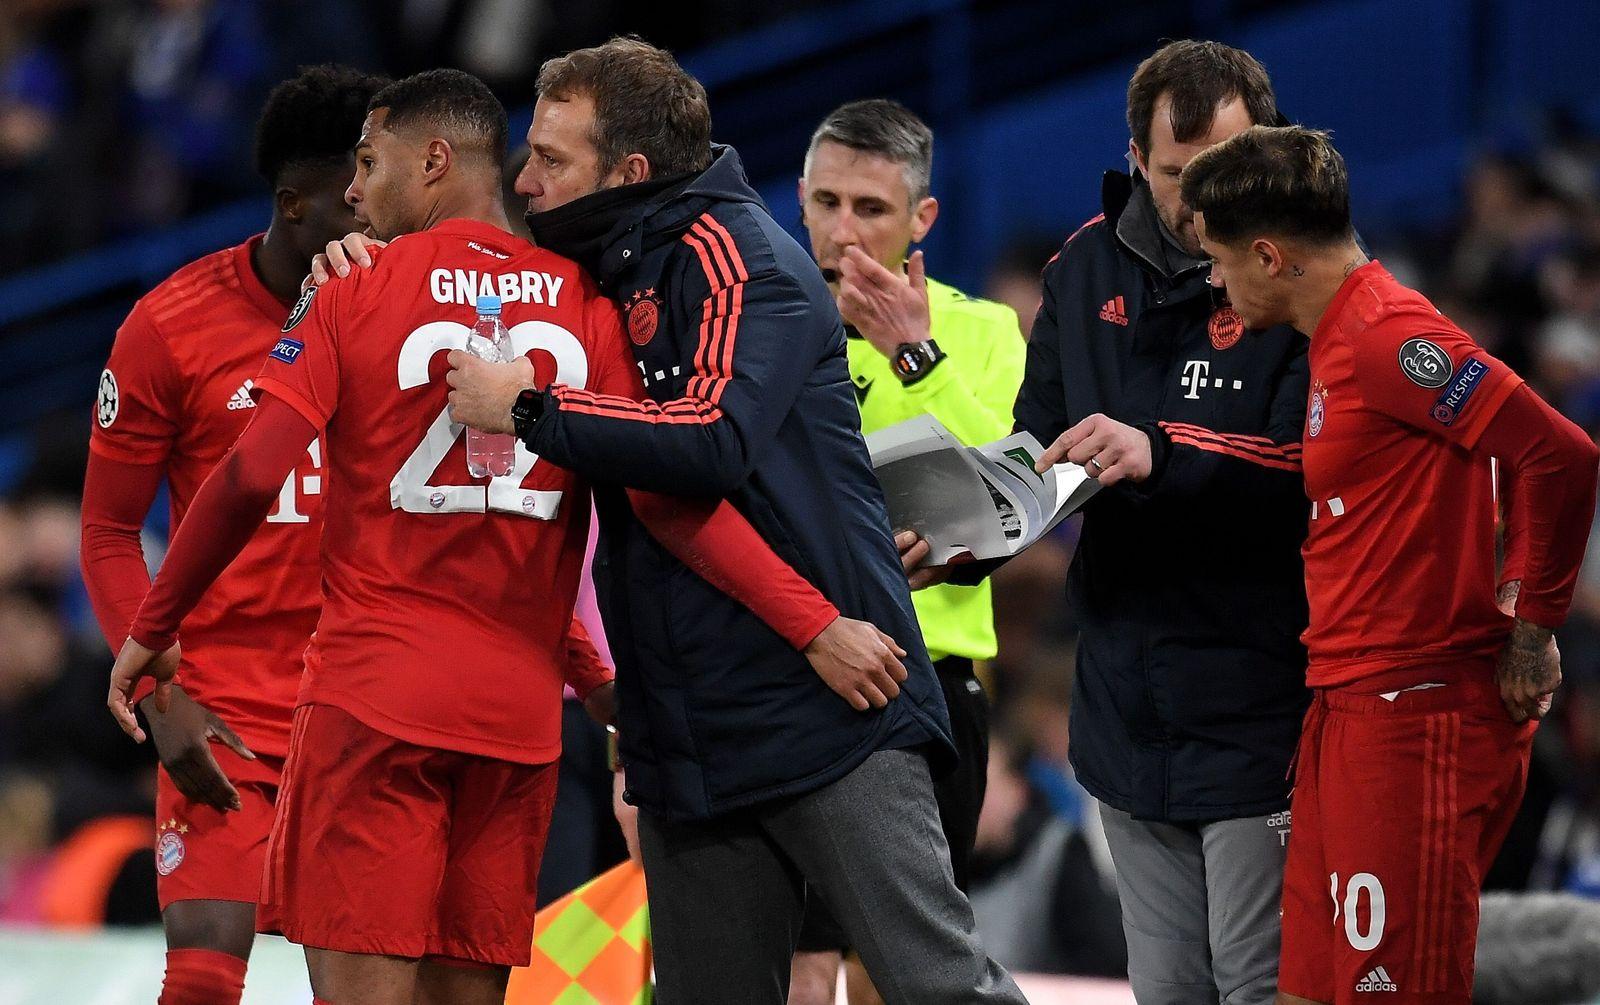 Chelsea FC vs Bayern Munich, London, United Kingdom - 25 Feb 2020